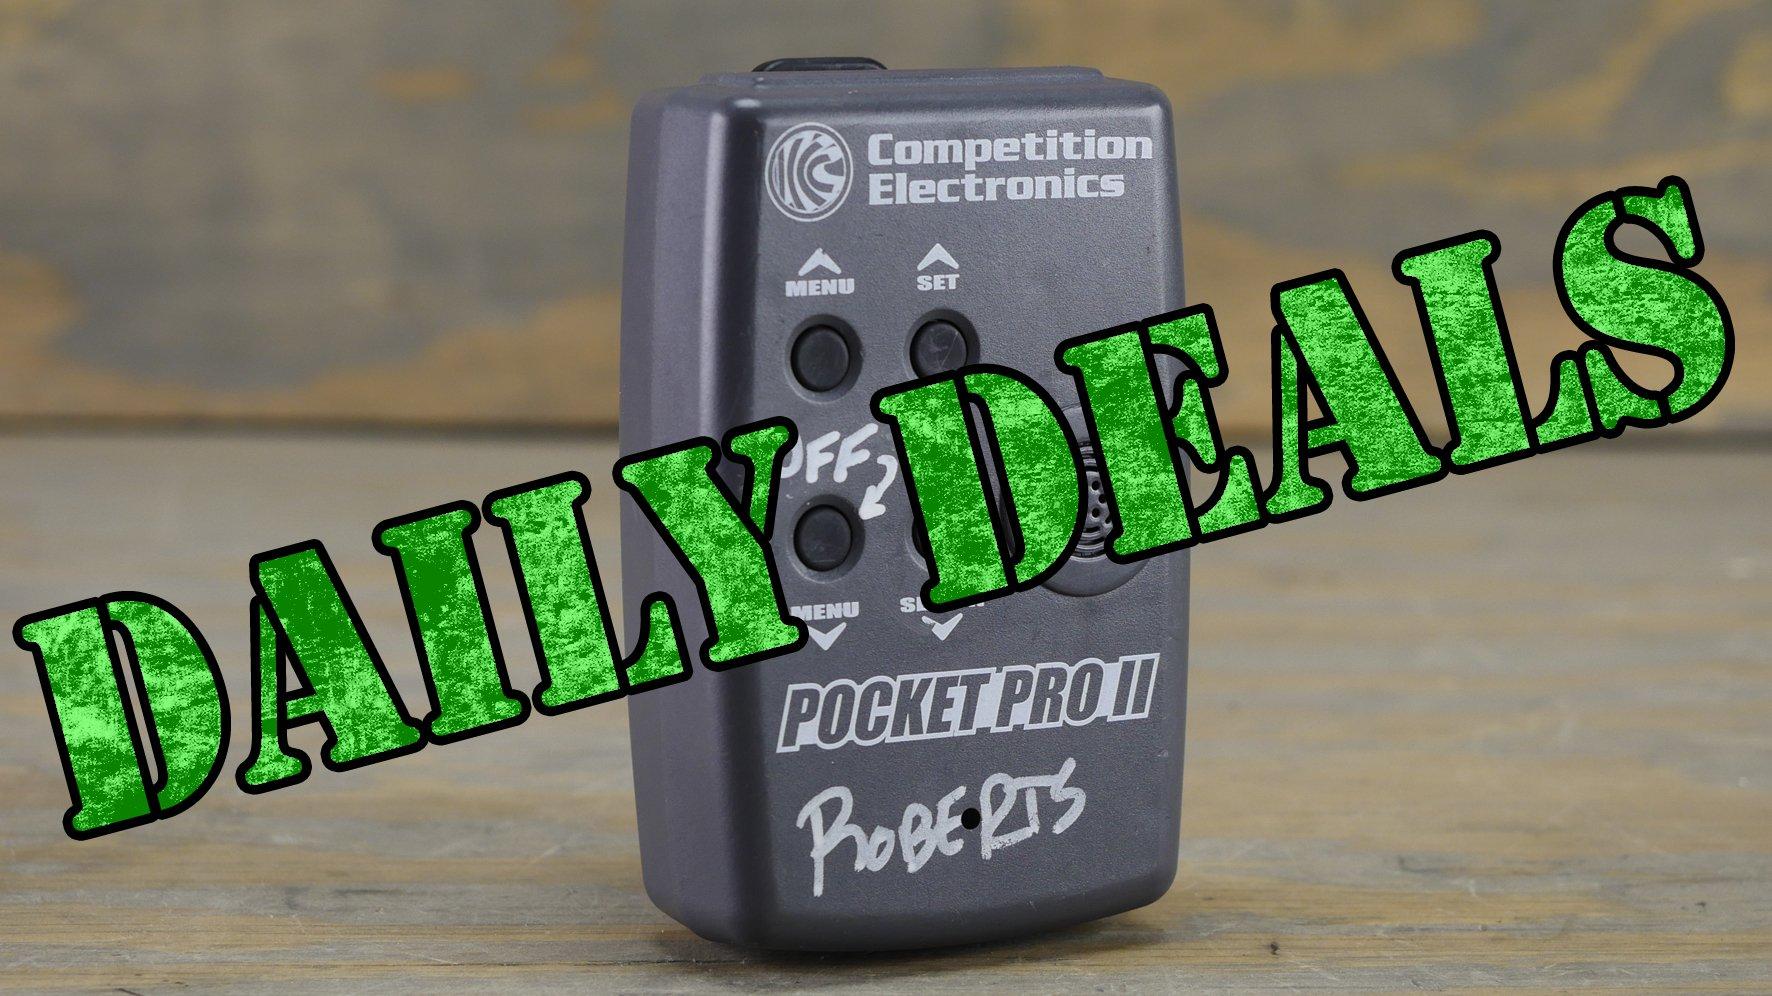 Pocket Pro Daily Deals